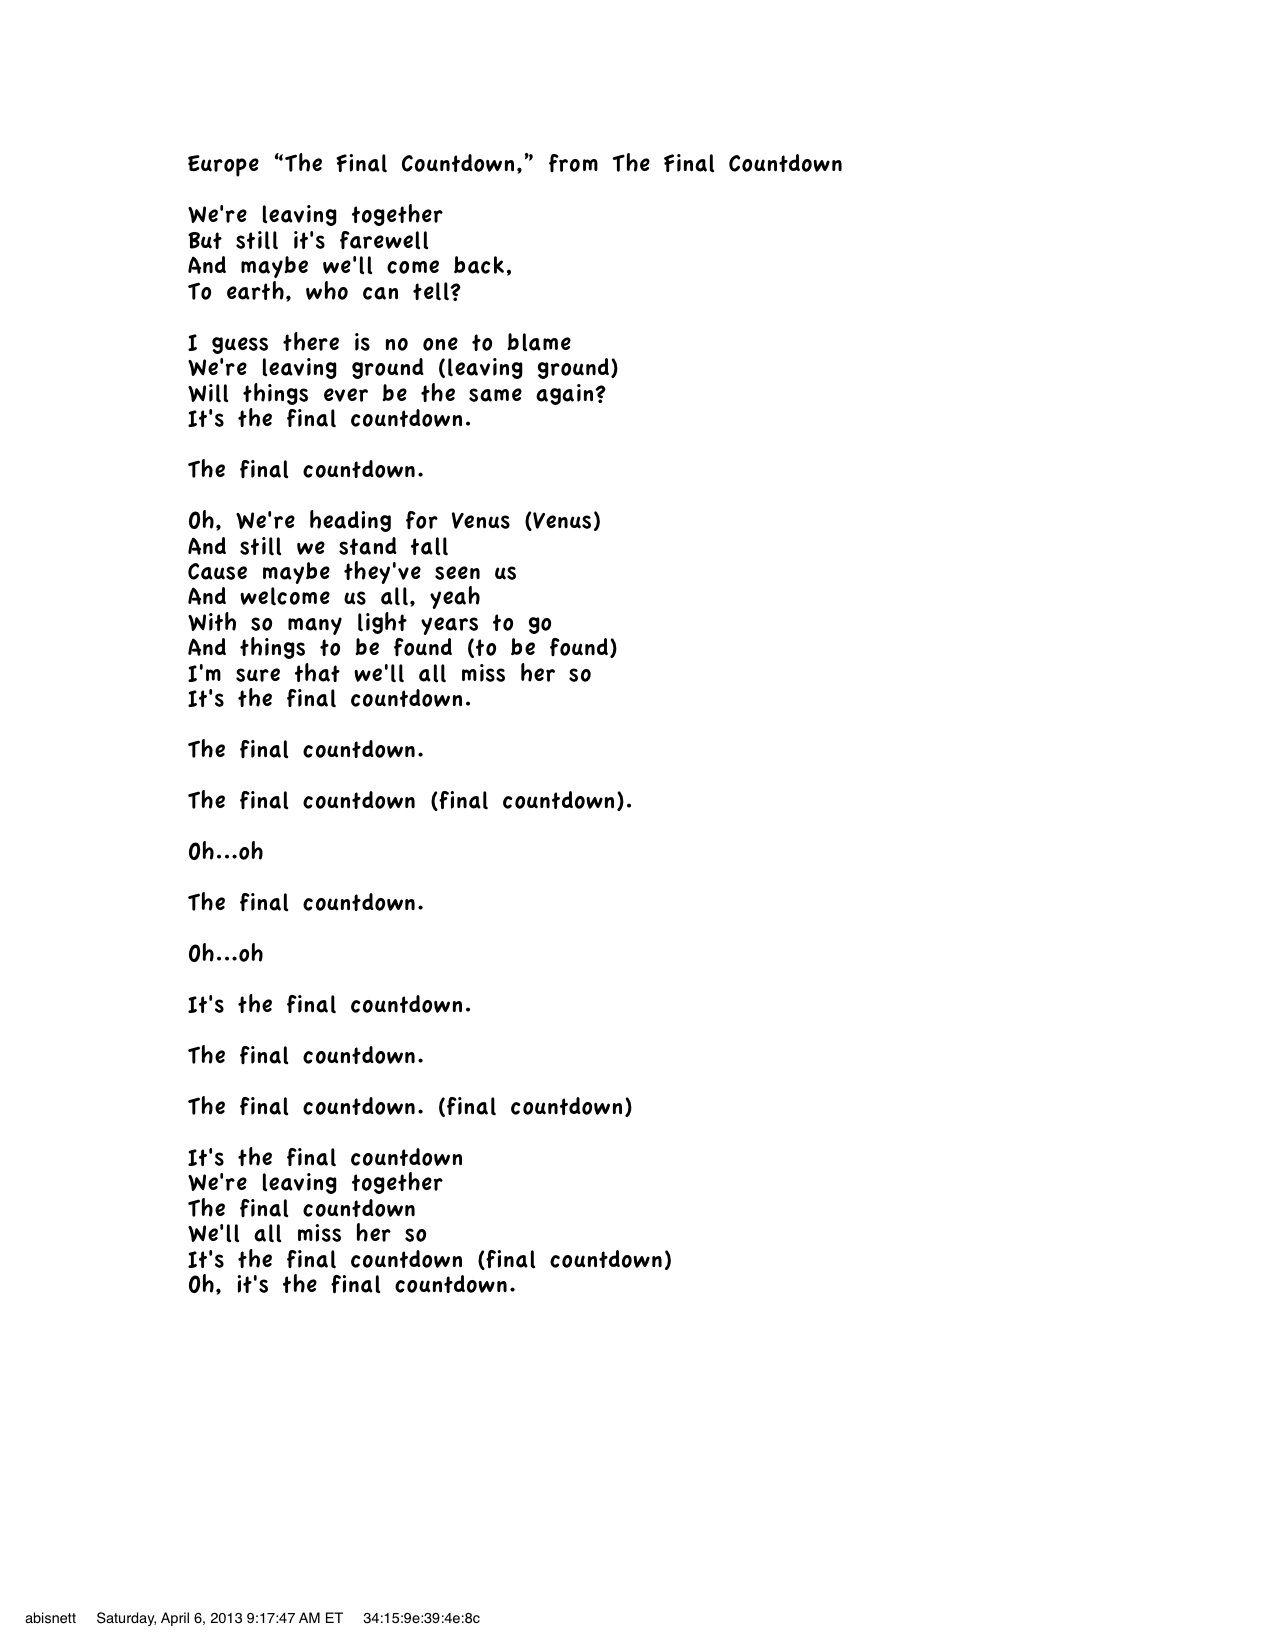 Europe – The Final Countdown Lyrics | Genius Lyrics